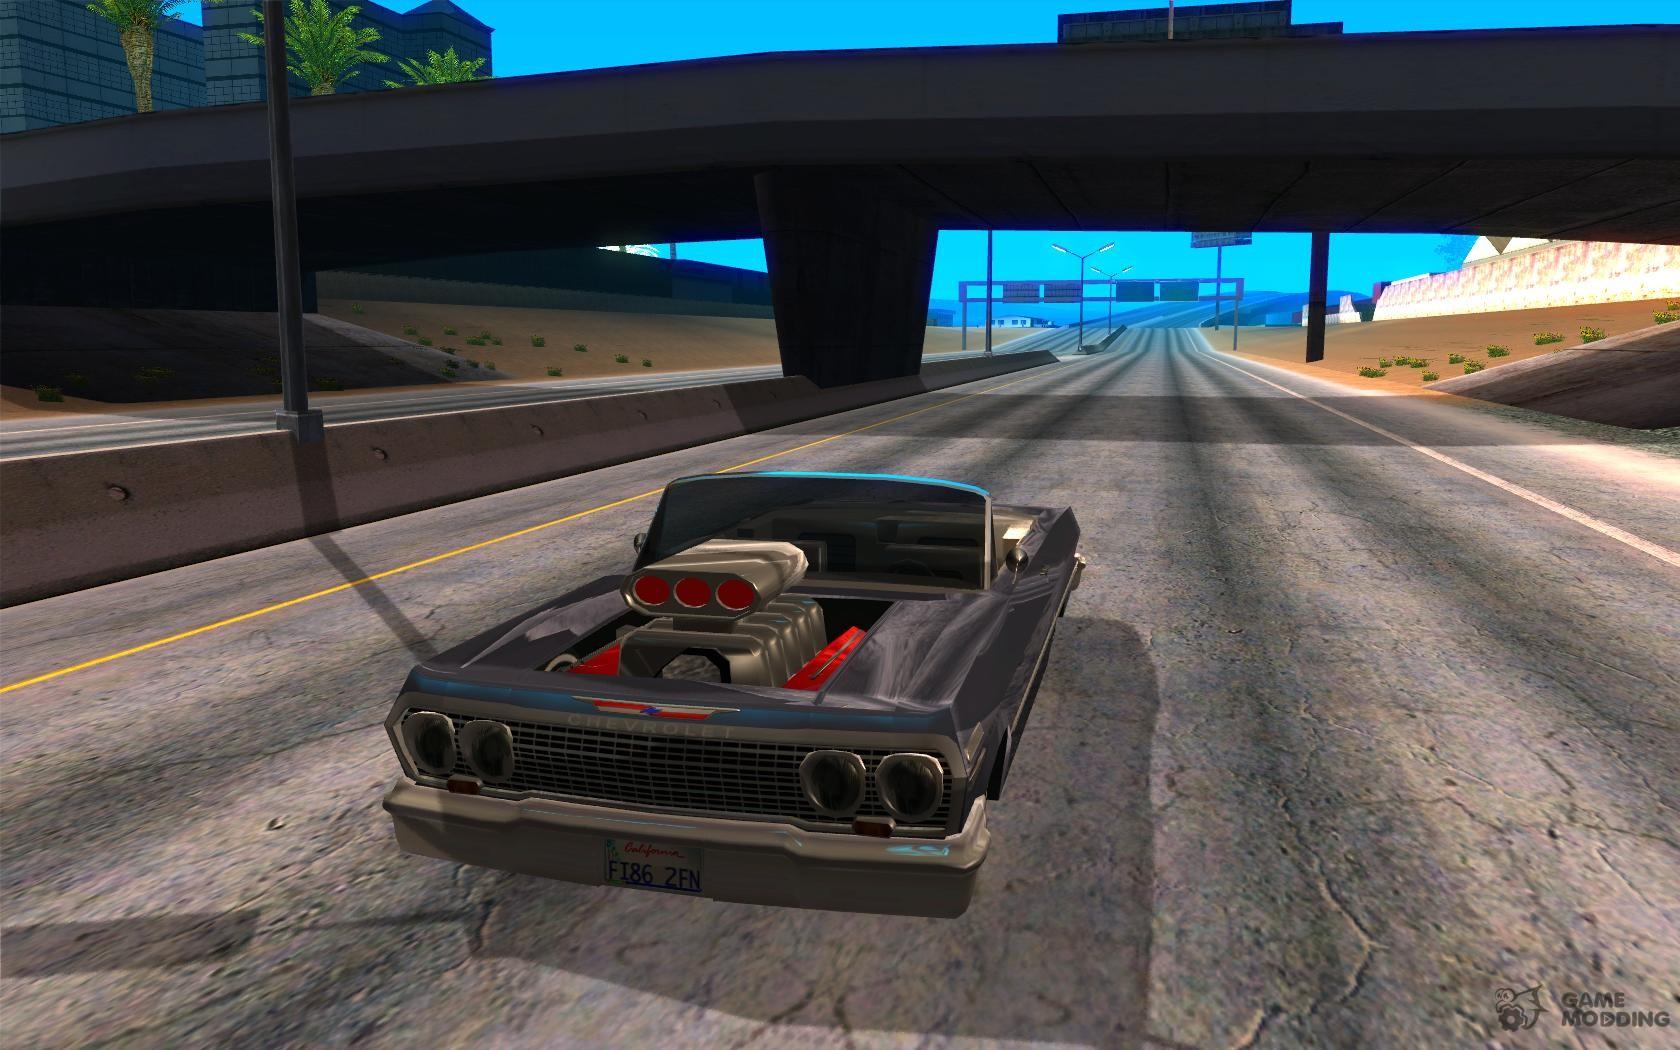 Chevrolet impala 4 door hardtop 1963 for gta san andreas - Chevrolet Impala 4 Door Hardtop 1963 For Gta San Andreas 33